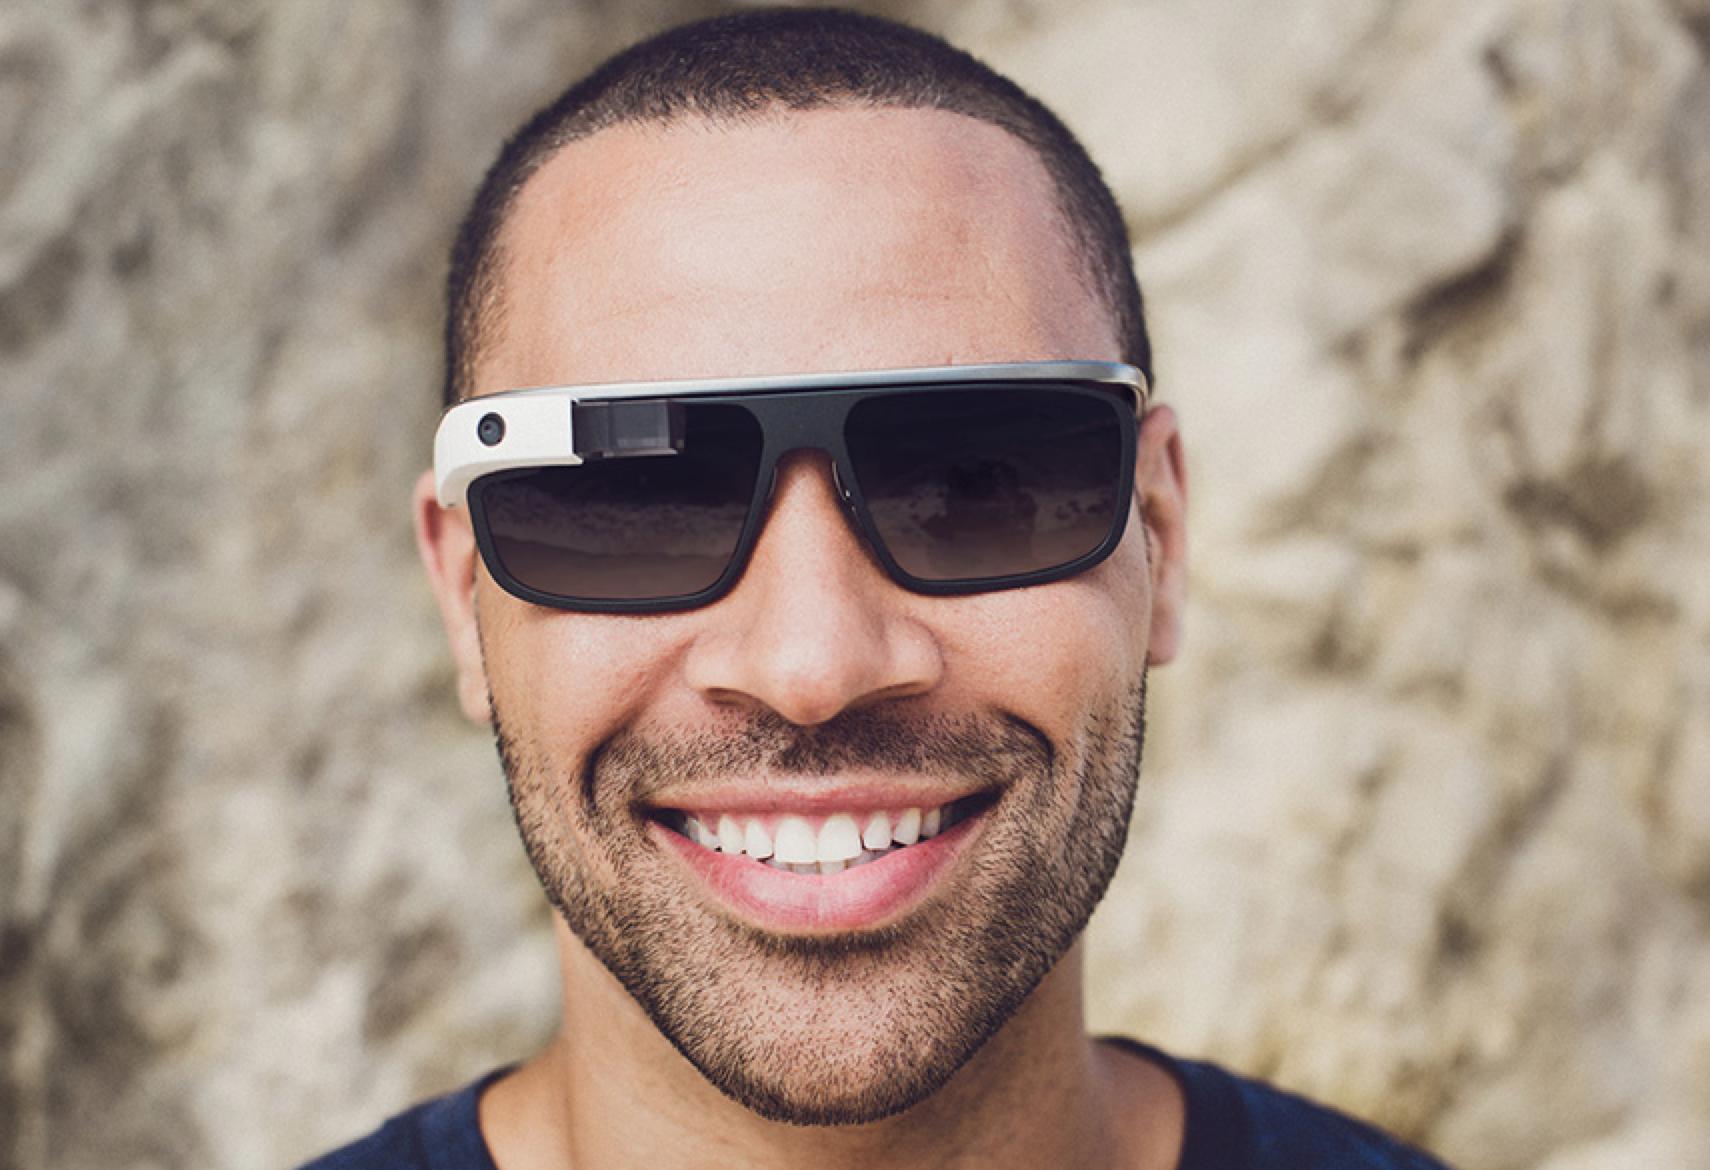 dace44df7b Google Glass Gets Stylish with Shades   Prescription Lenses